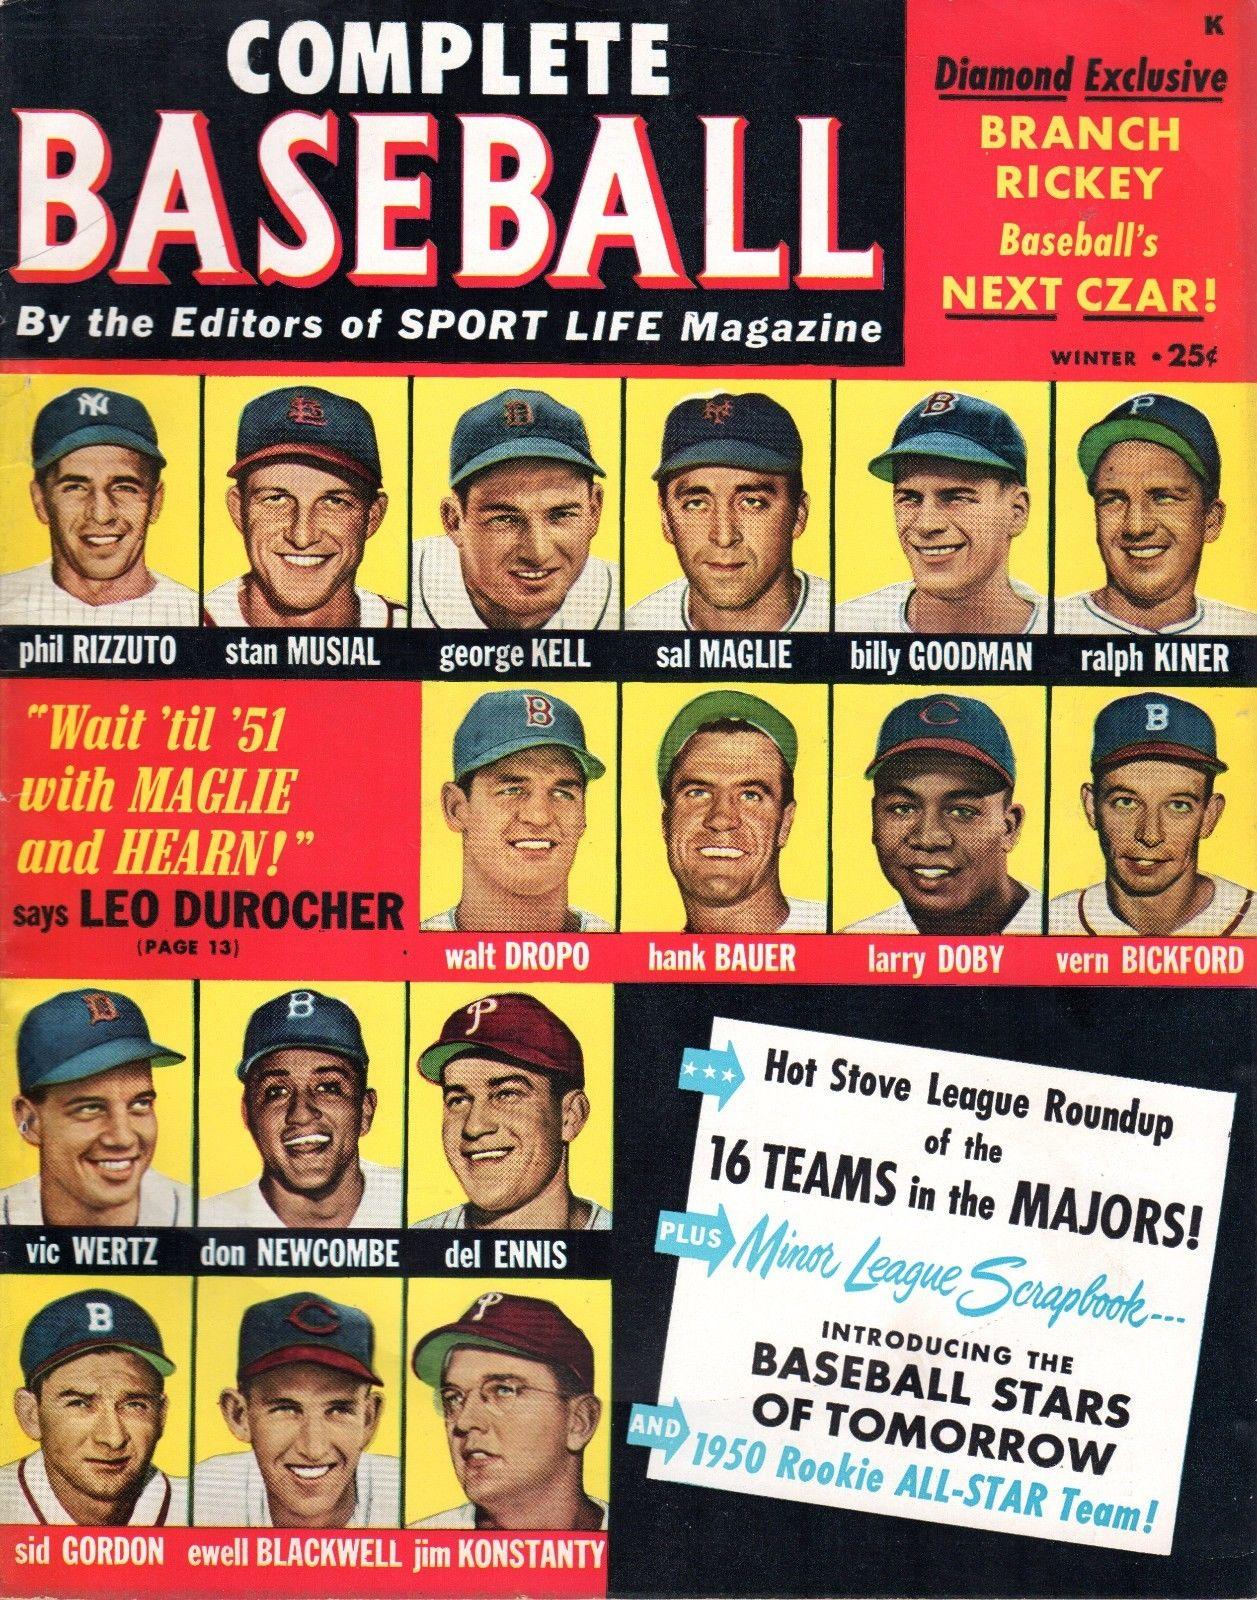 Complete Baseball Vol II 4